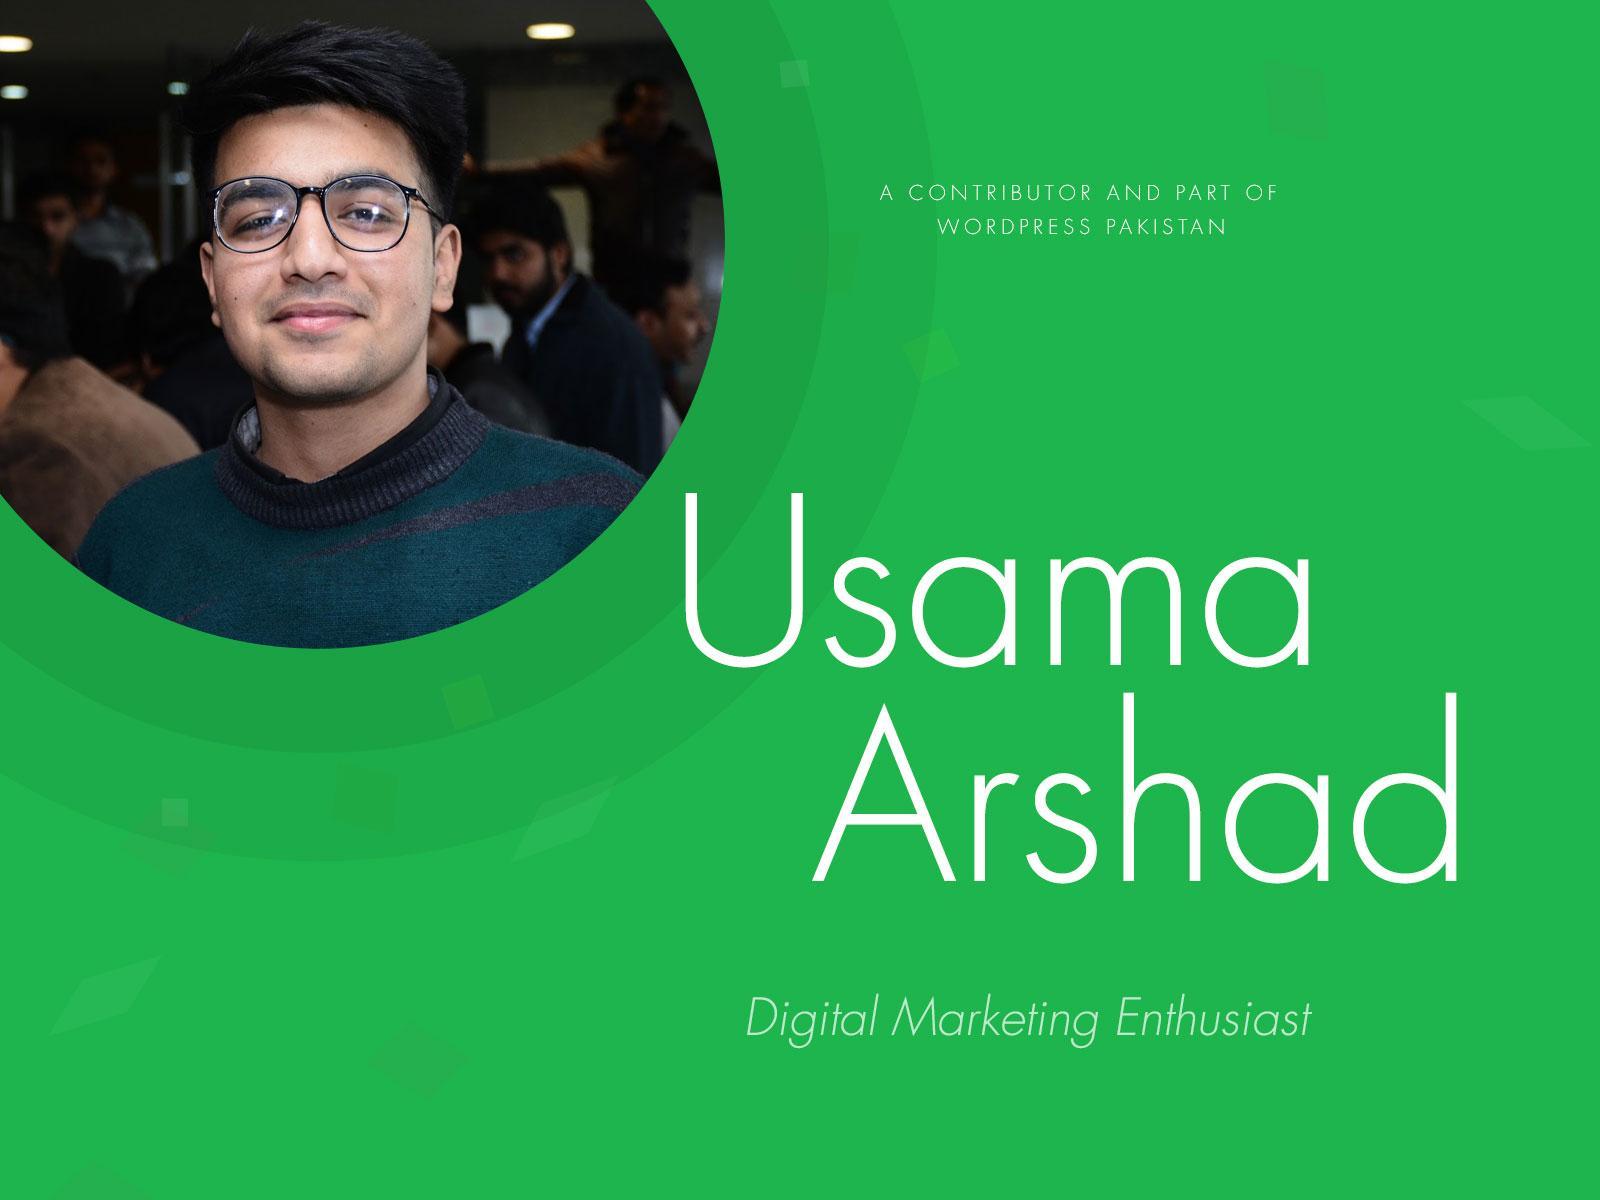 WPPK-Usama-Arshad-WordPress-Pakistan